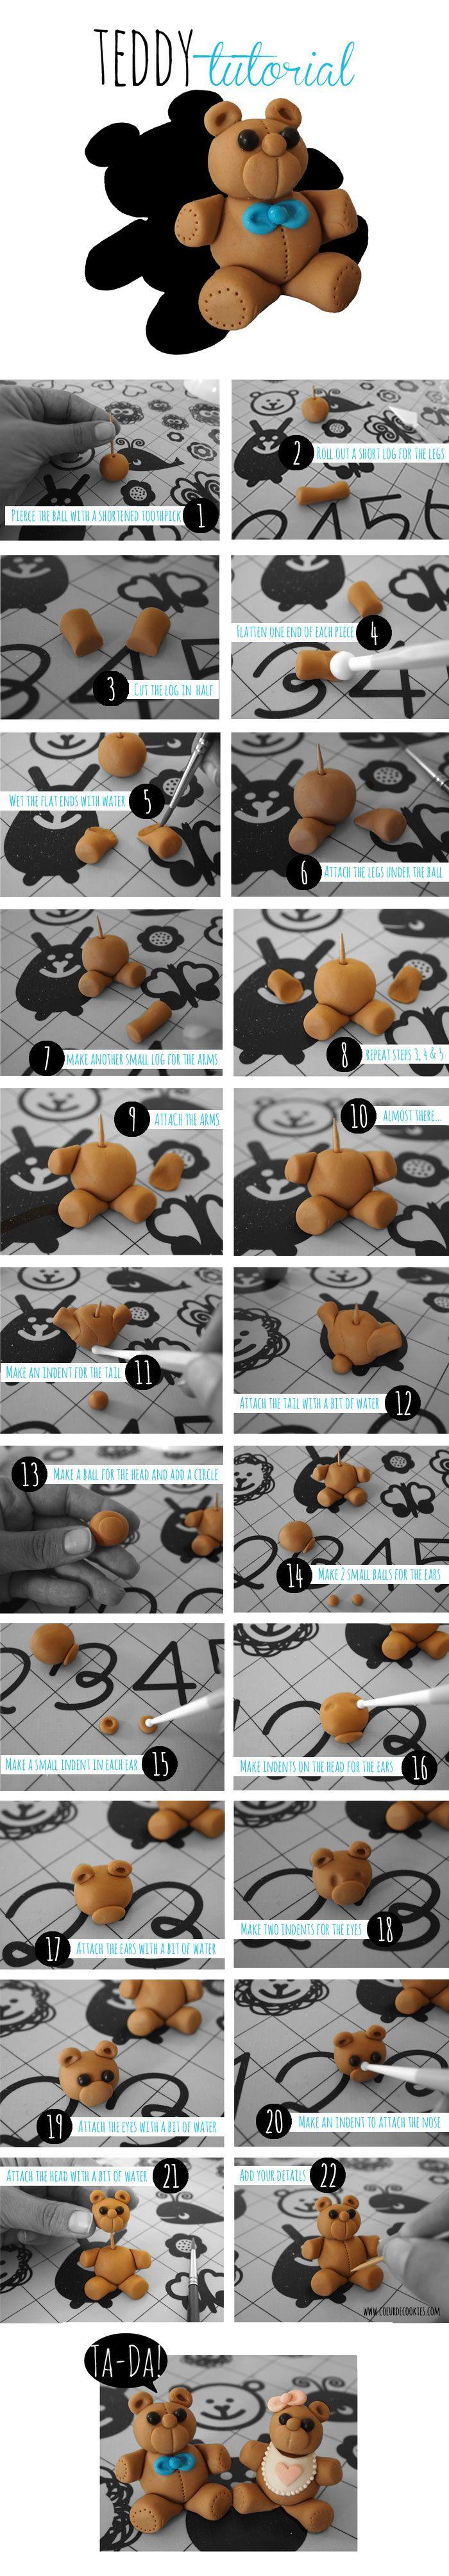 Gumpaste Teddy Bear Tutorial - Coeur de Cookies #fondant #gumpaste #sugarpaste #figures